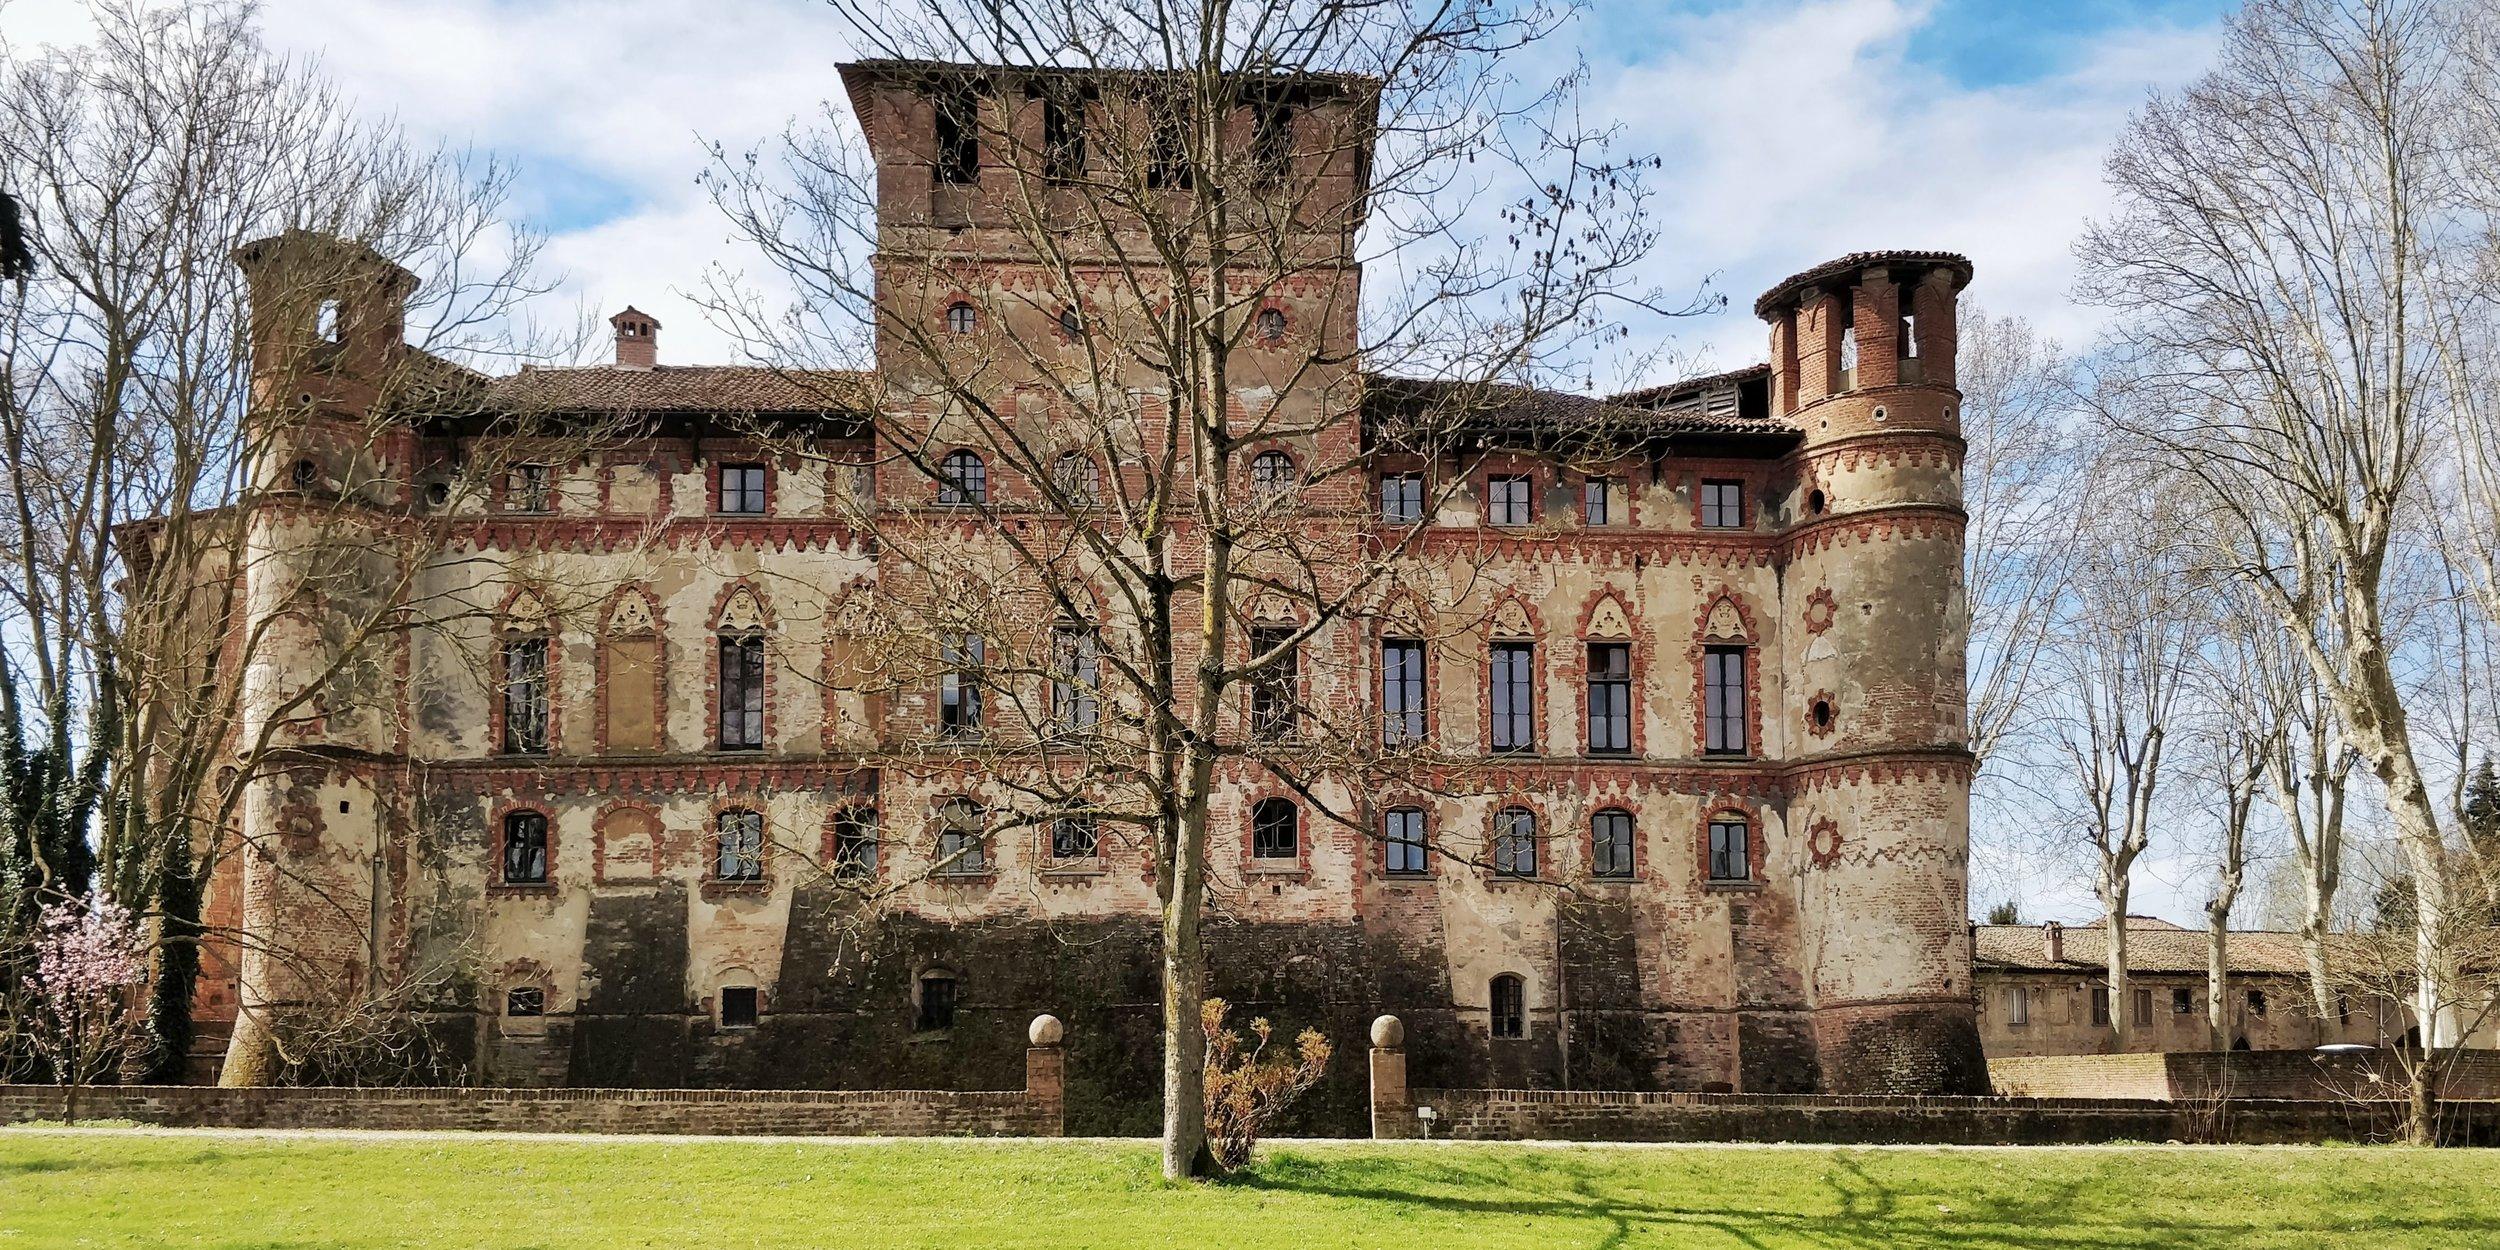 Castello di Piovera - Alessandria, Piemonte, Italia